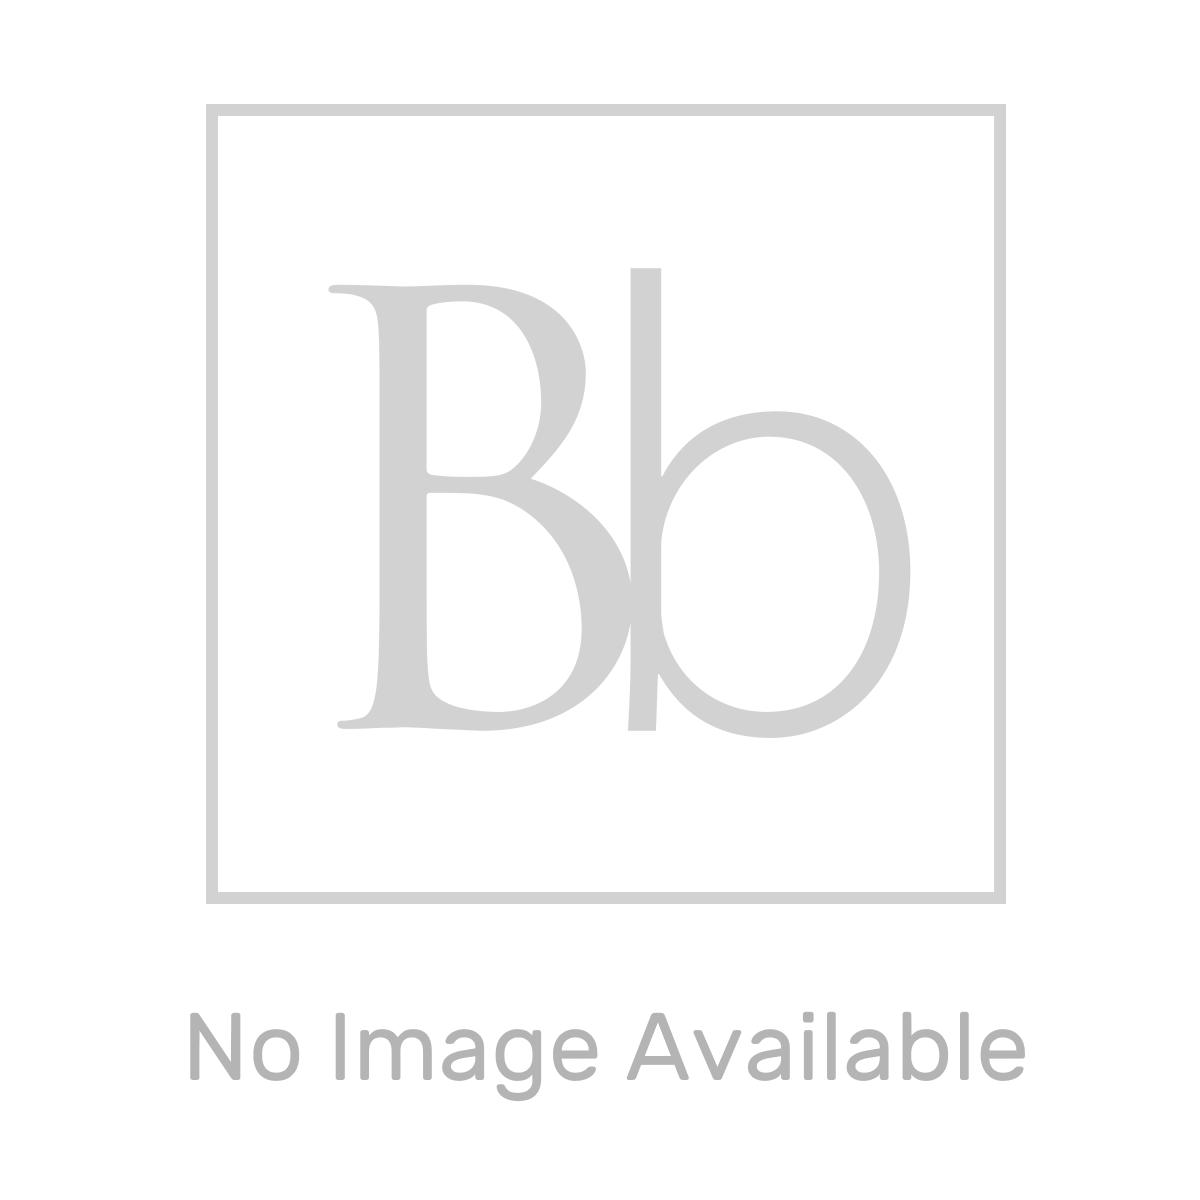 RAK Curve Shower Bath Mixer Tap